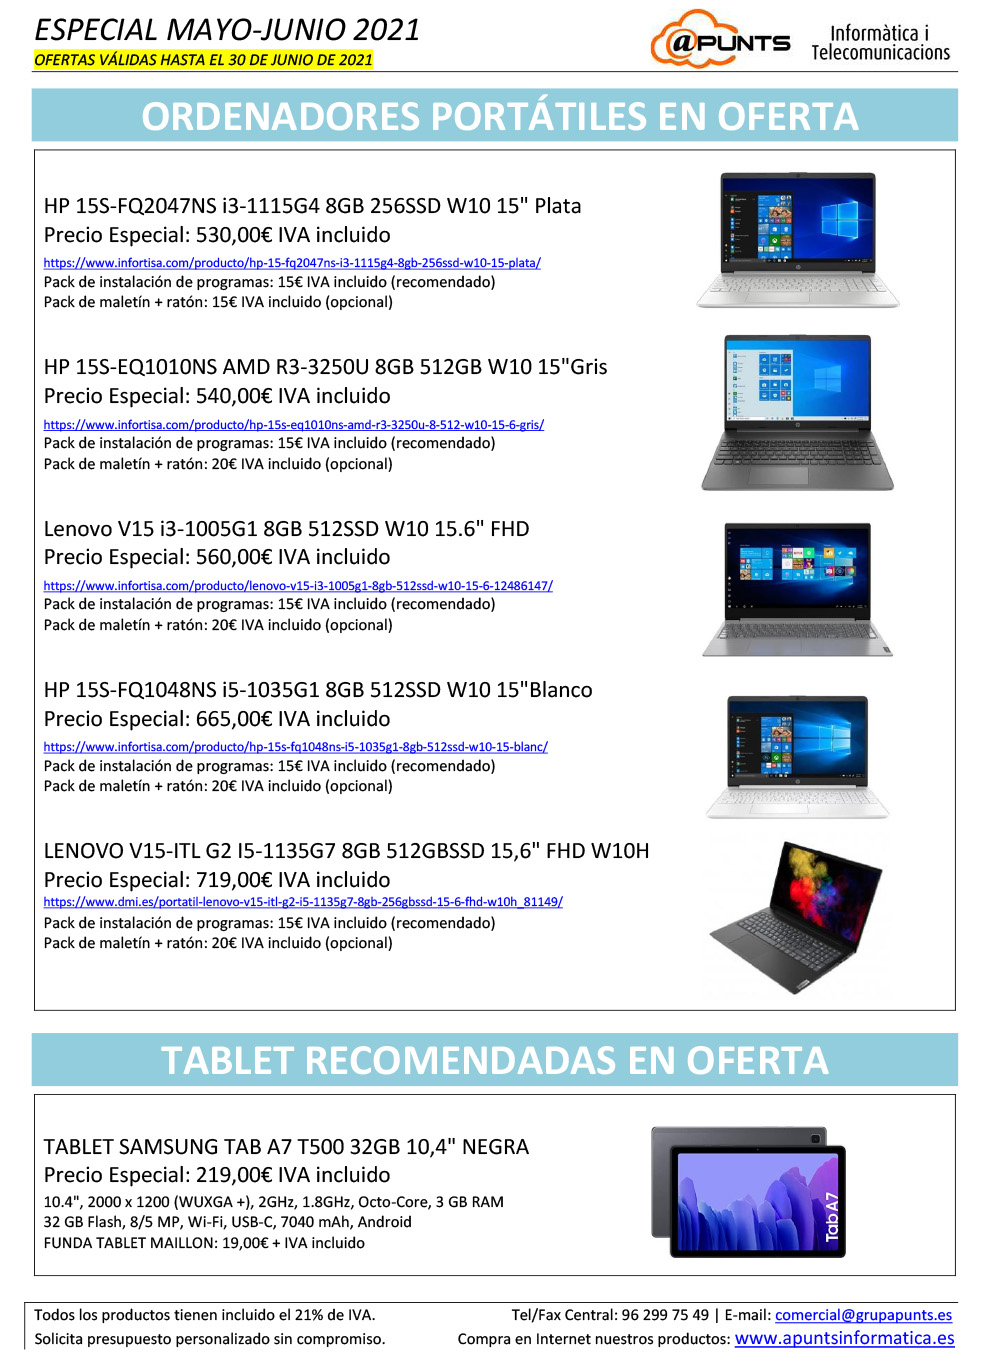 ofertas-portatiles-ordenadores-mayo2021-1